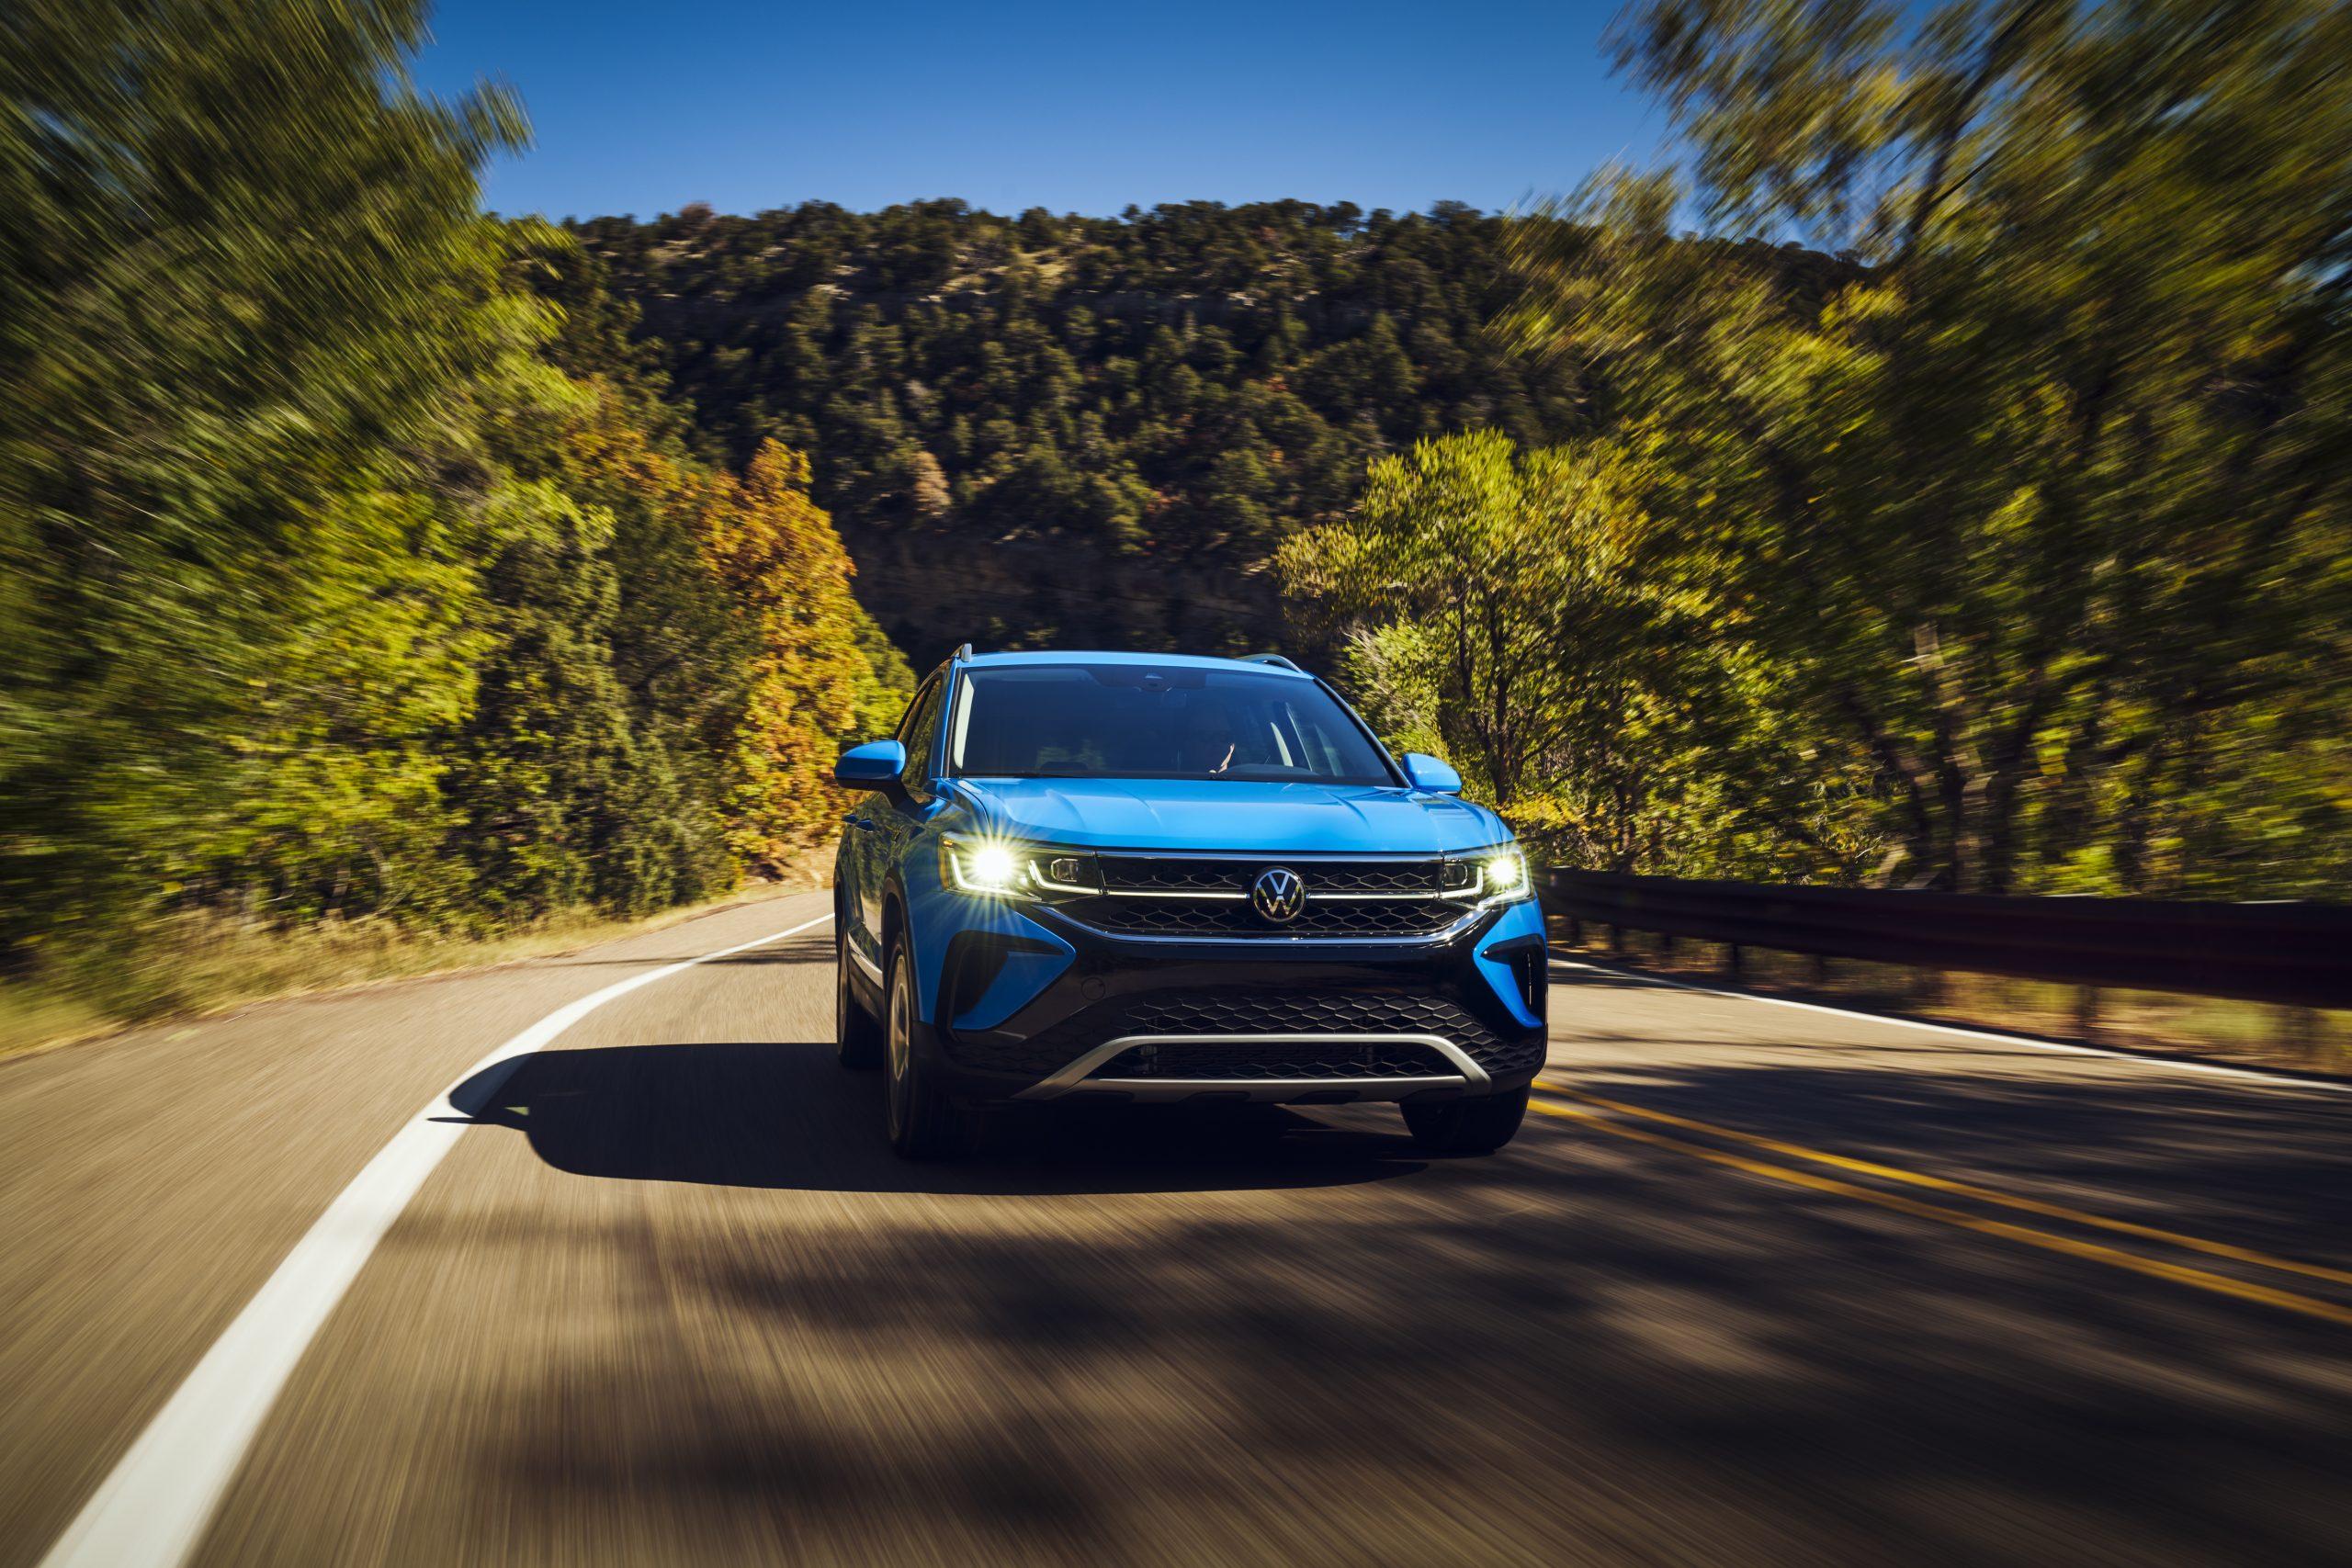 2022 Volkswagen Taos driving front three quarter